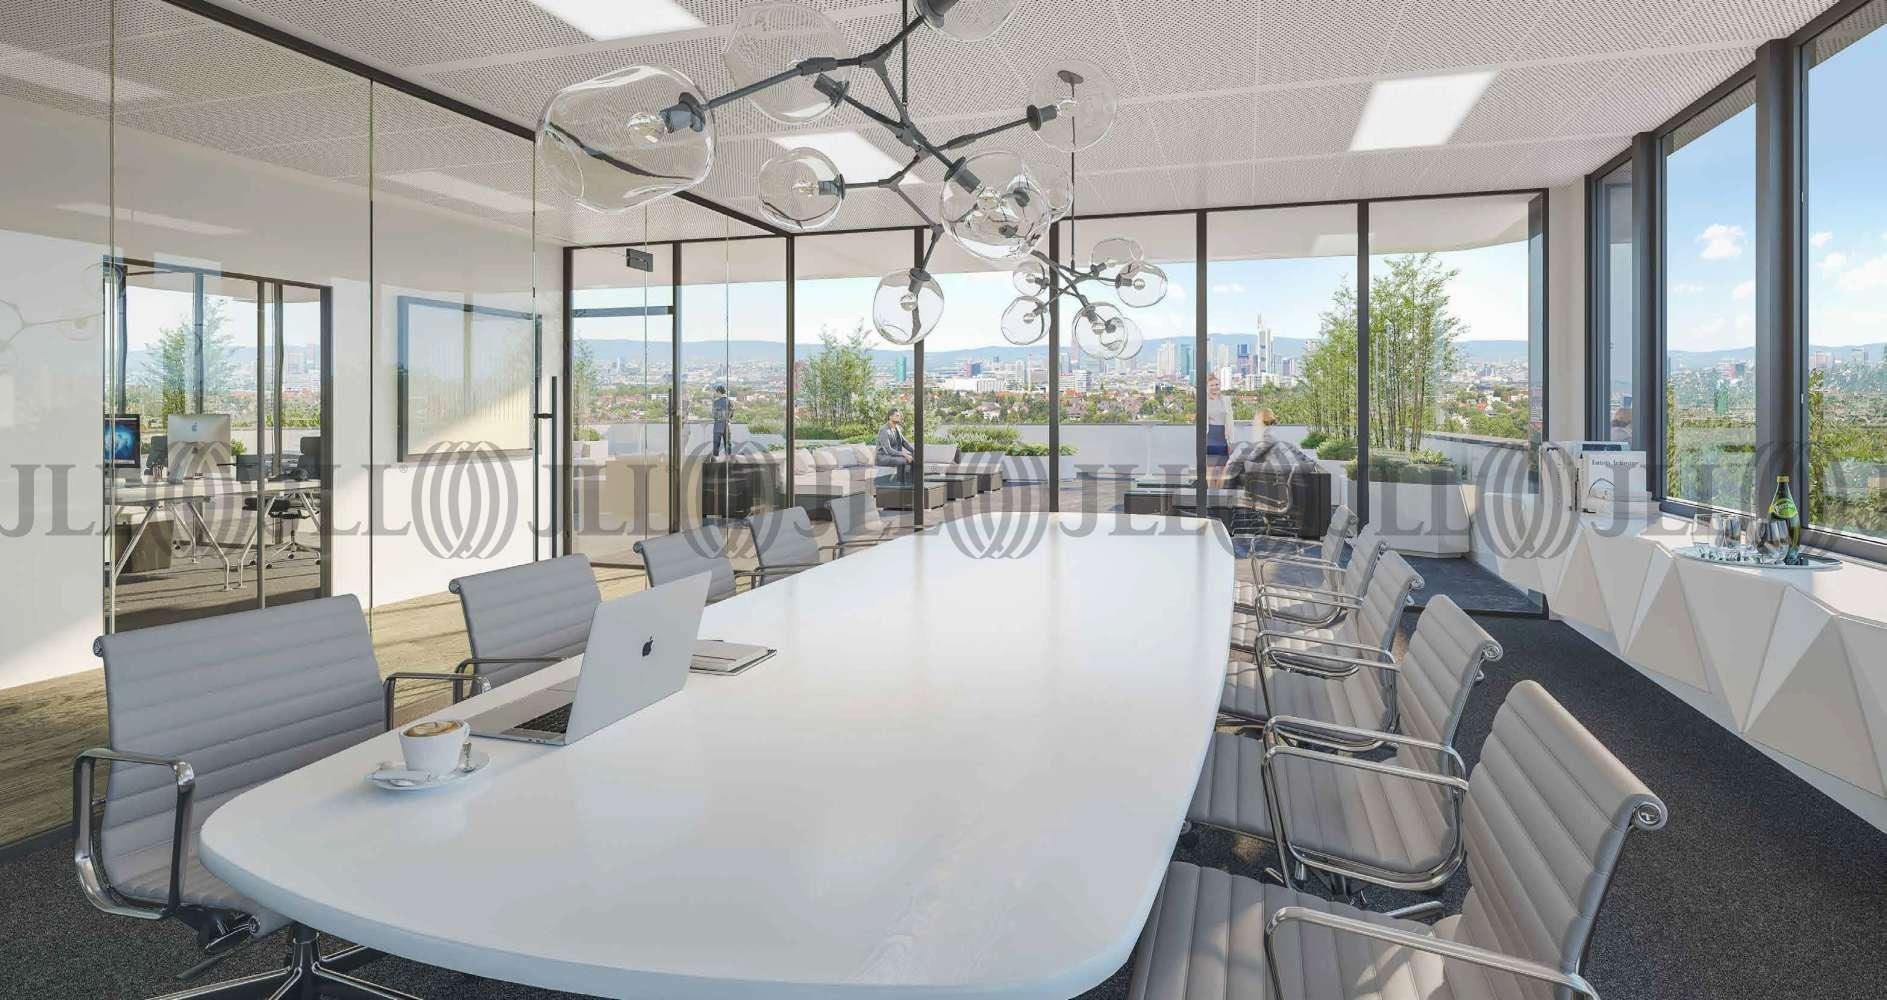 Büros Frankfurt am main, 60437 - Büro - Frankfurt am Main, Nieder-Eschbach - F2584 - 10534019